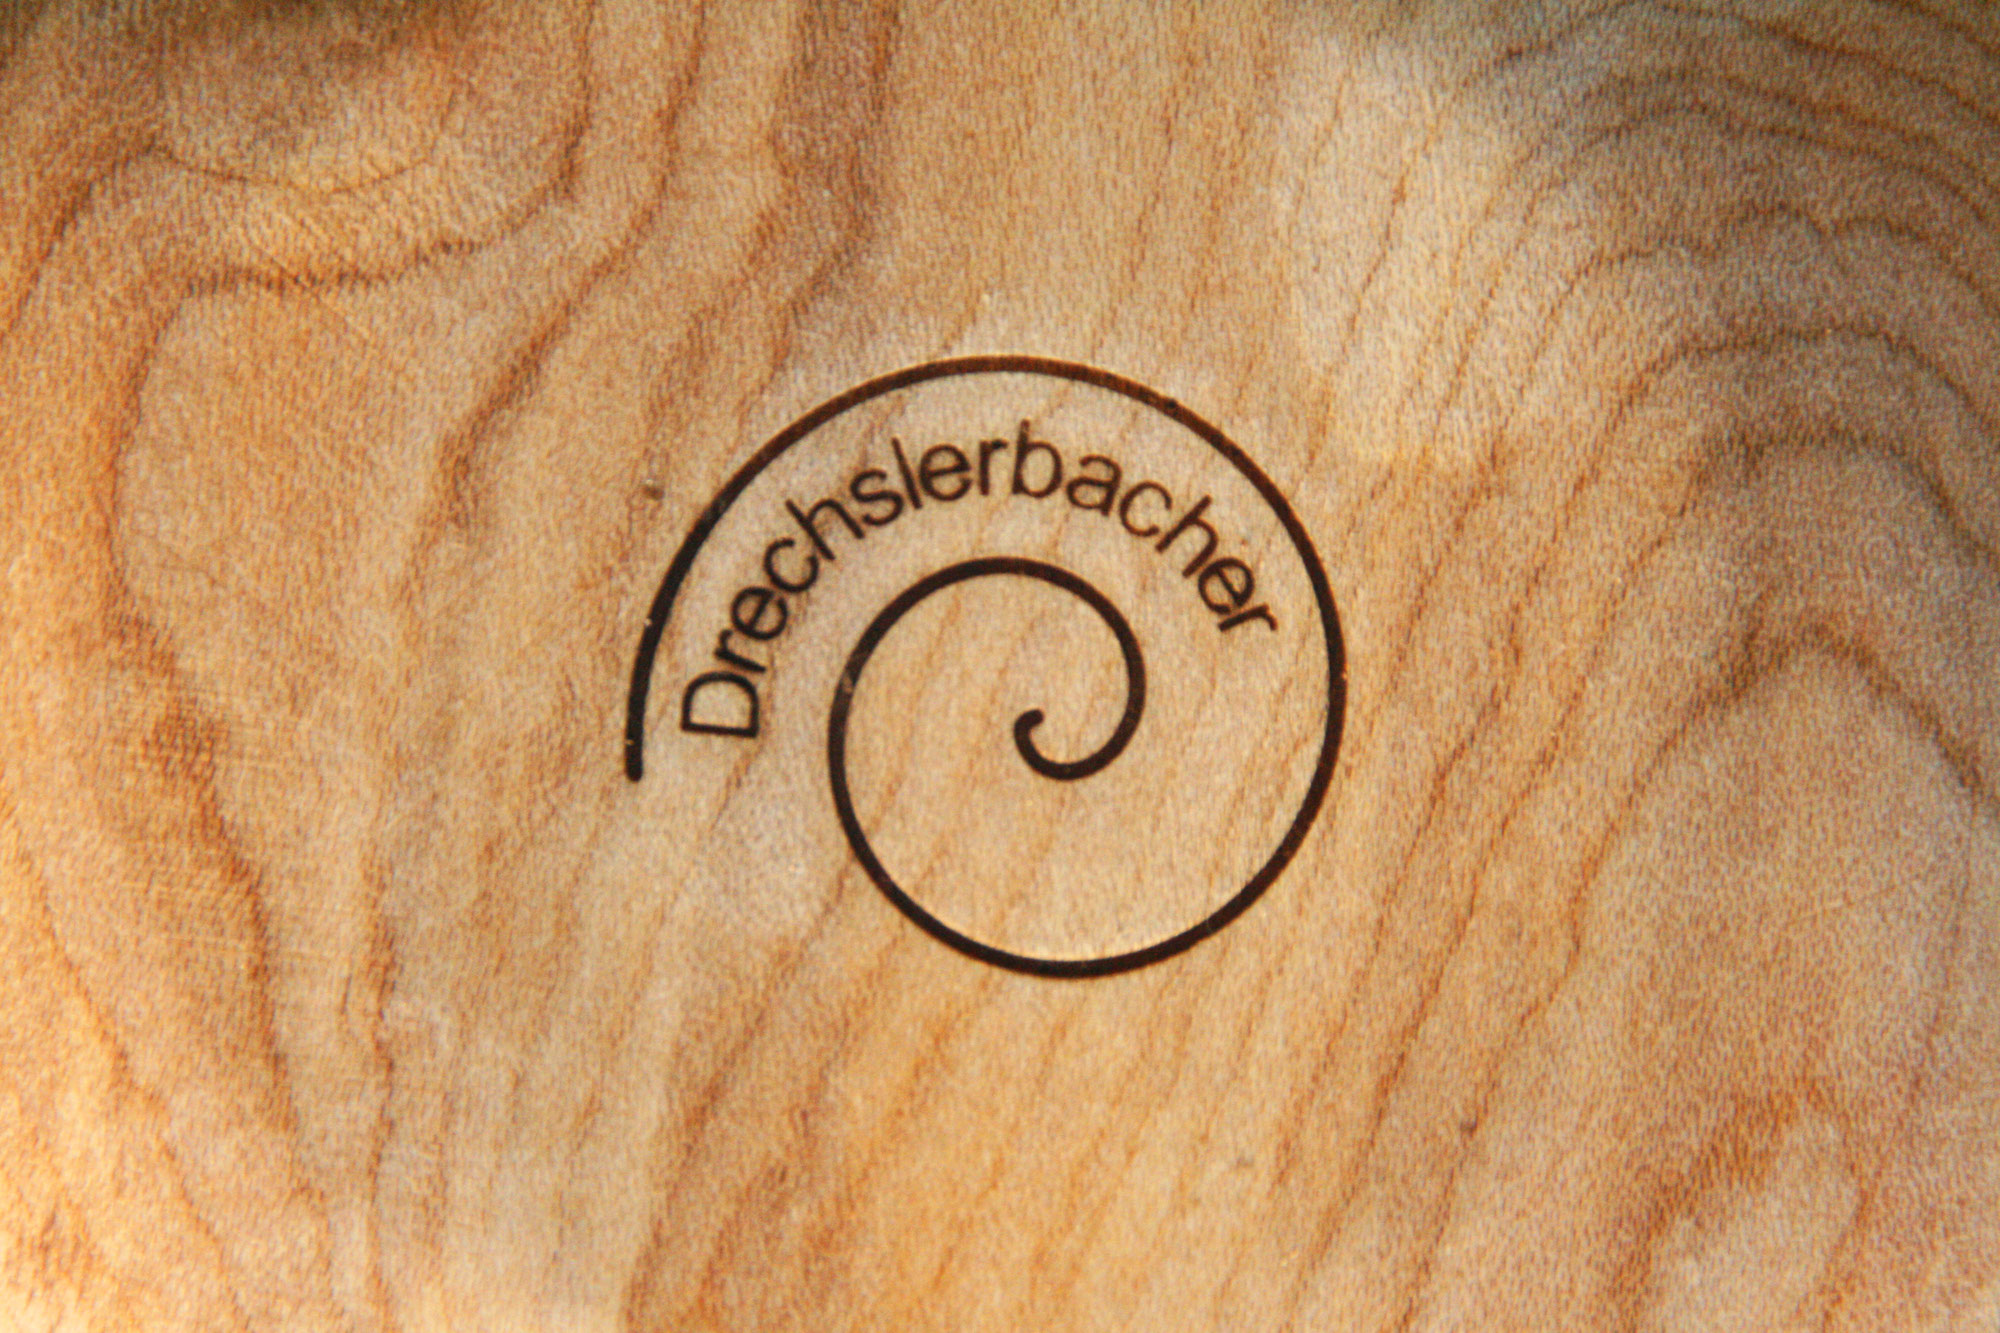 willkommen bei drechslerbacher drechslerbachers webseite. Black Bedroom Furniture Sets. Home Design Ideas